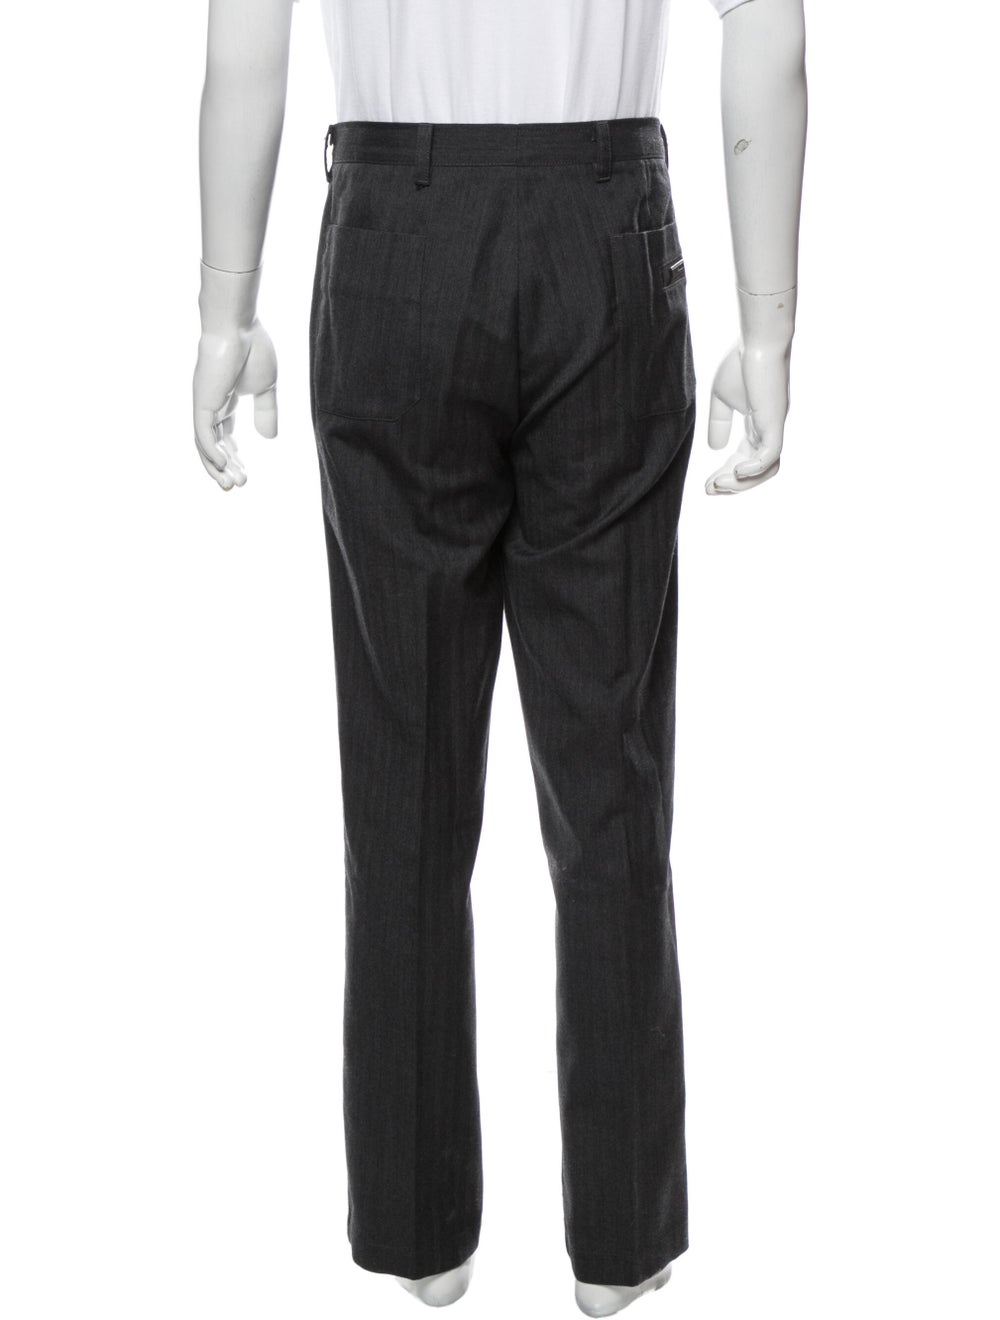 Prada Sport Dress Pants Grey - image 3